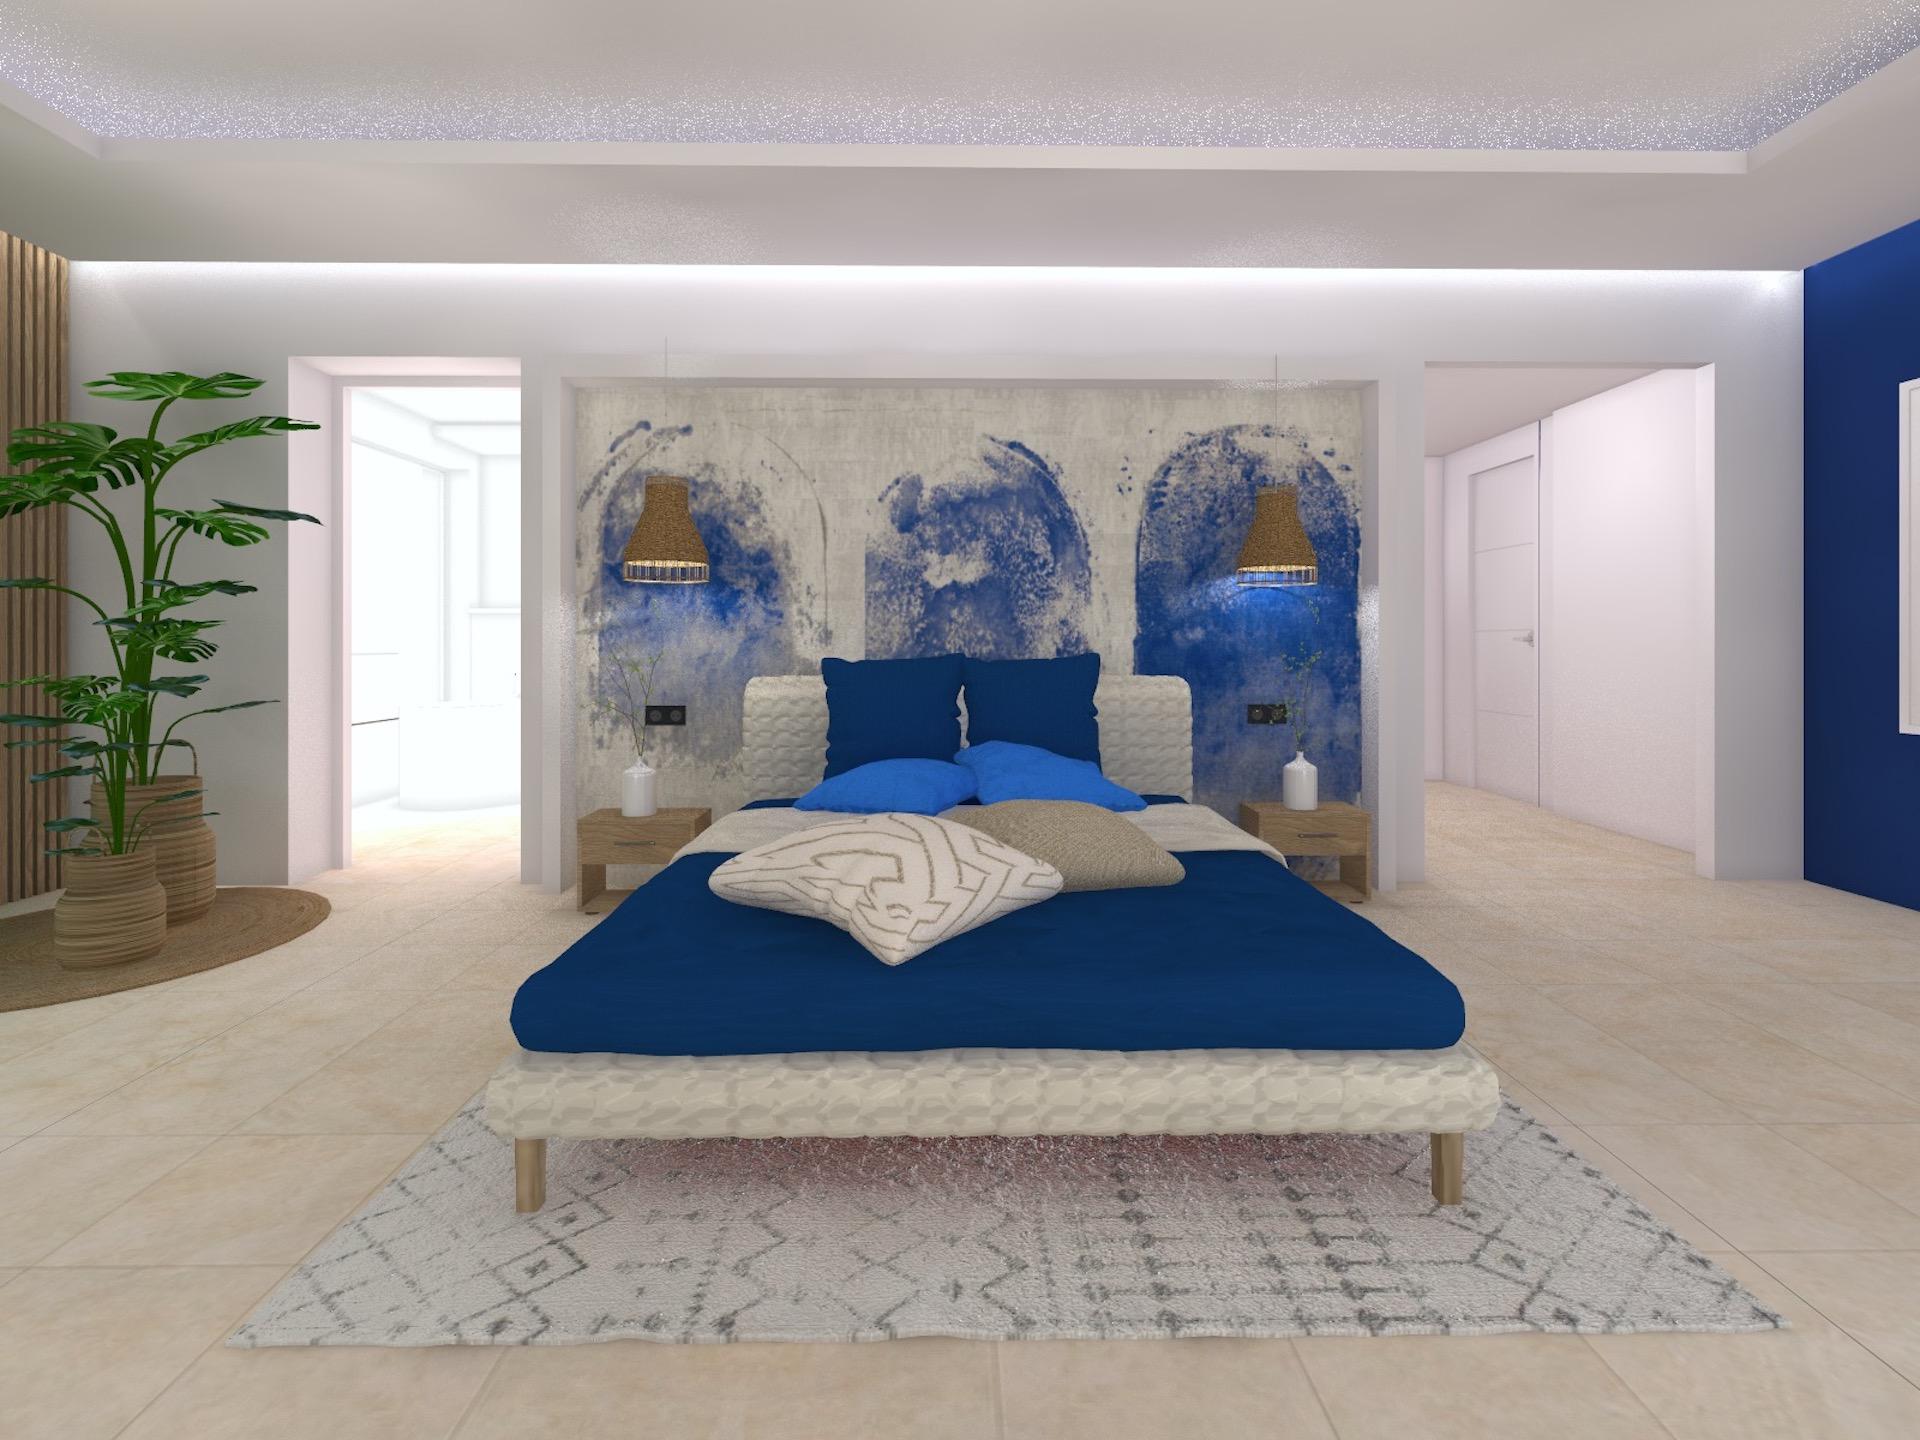 renovation villa luxe semaphore sainte-maxime var architecture interieure21